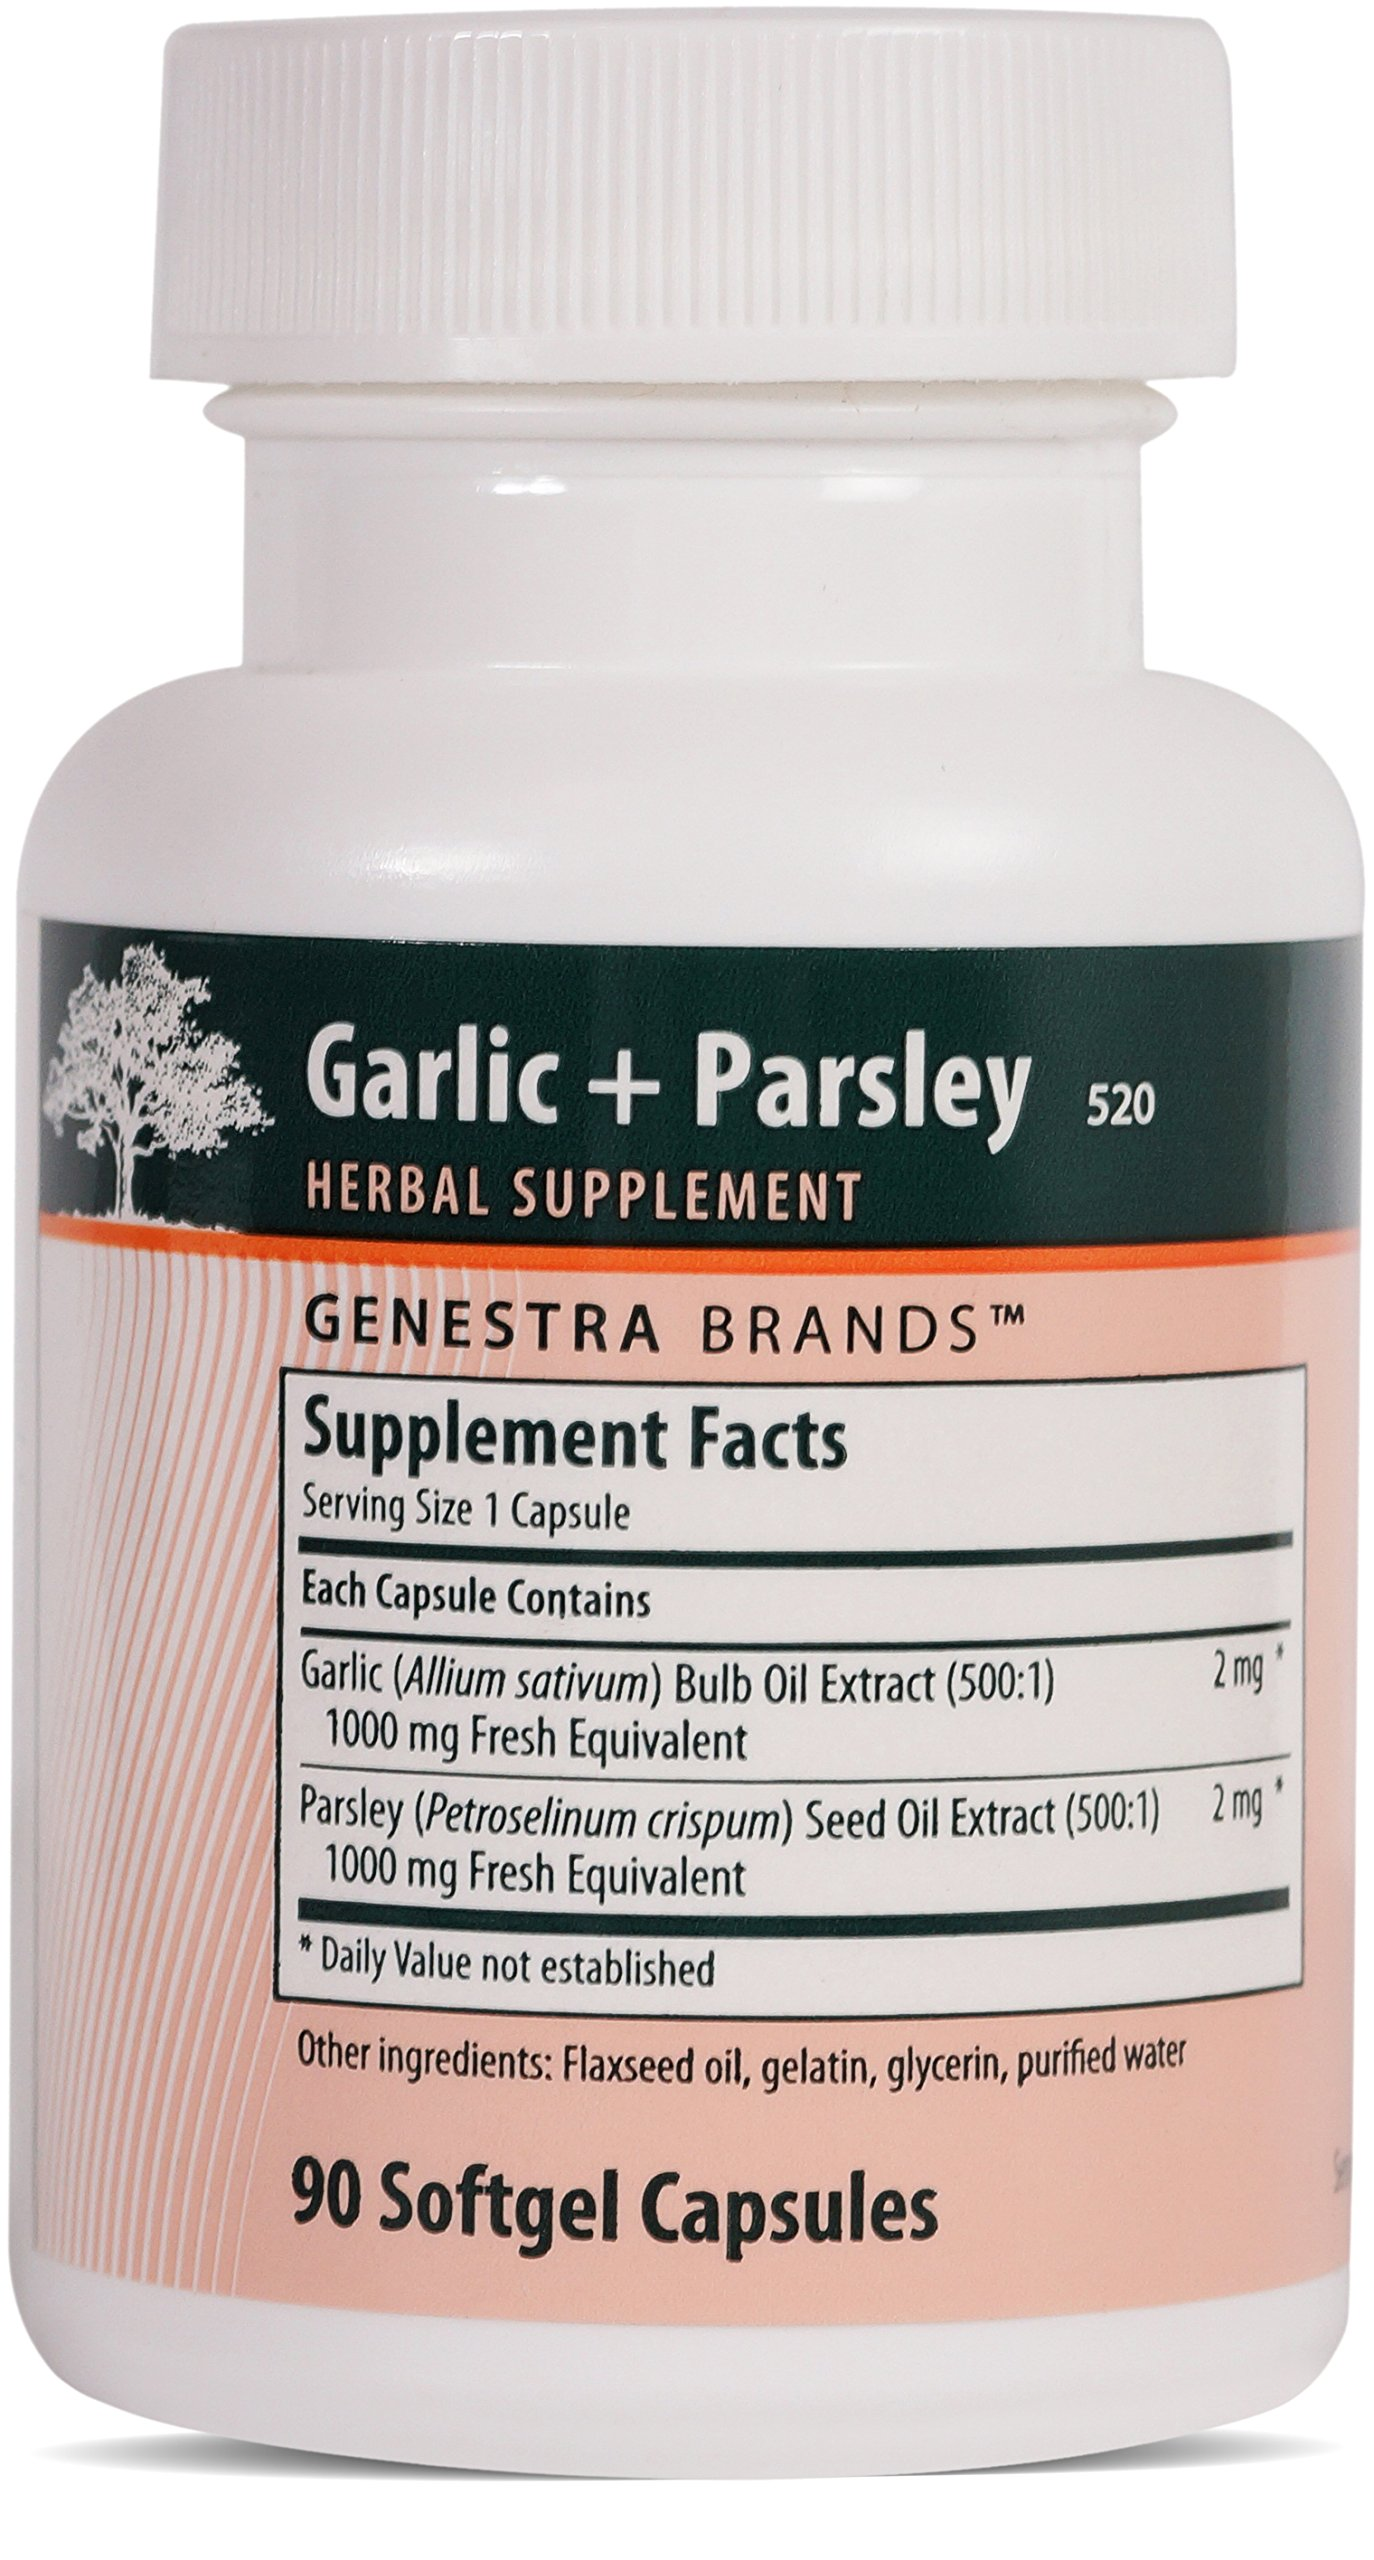 Genestra Brands - Garlic + Parsley - Unique Blend of Garlic and Parsley Oils - 90 Capsules